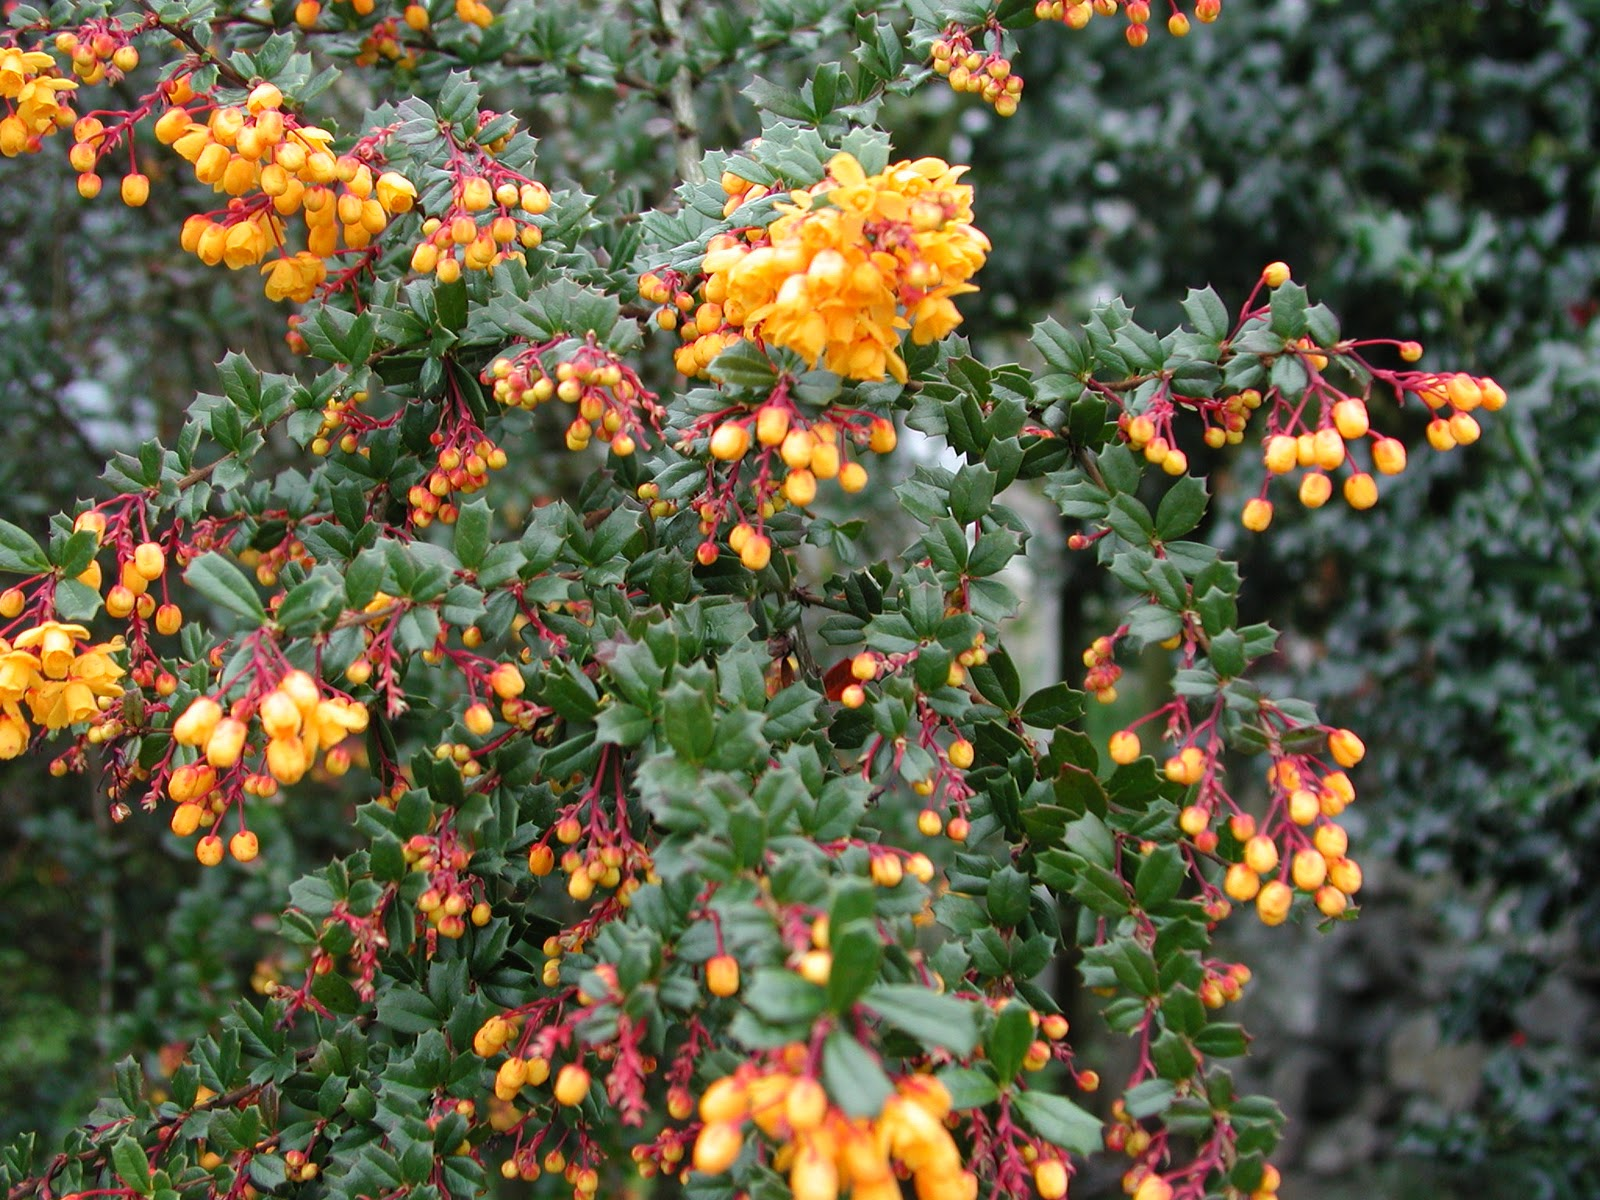 Cultus bay nursery berberis corylopsis osmanthus for The evergreen